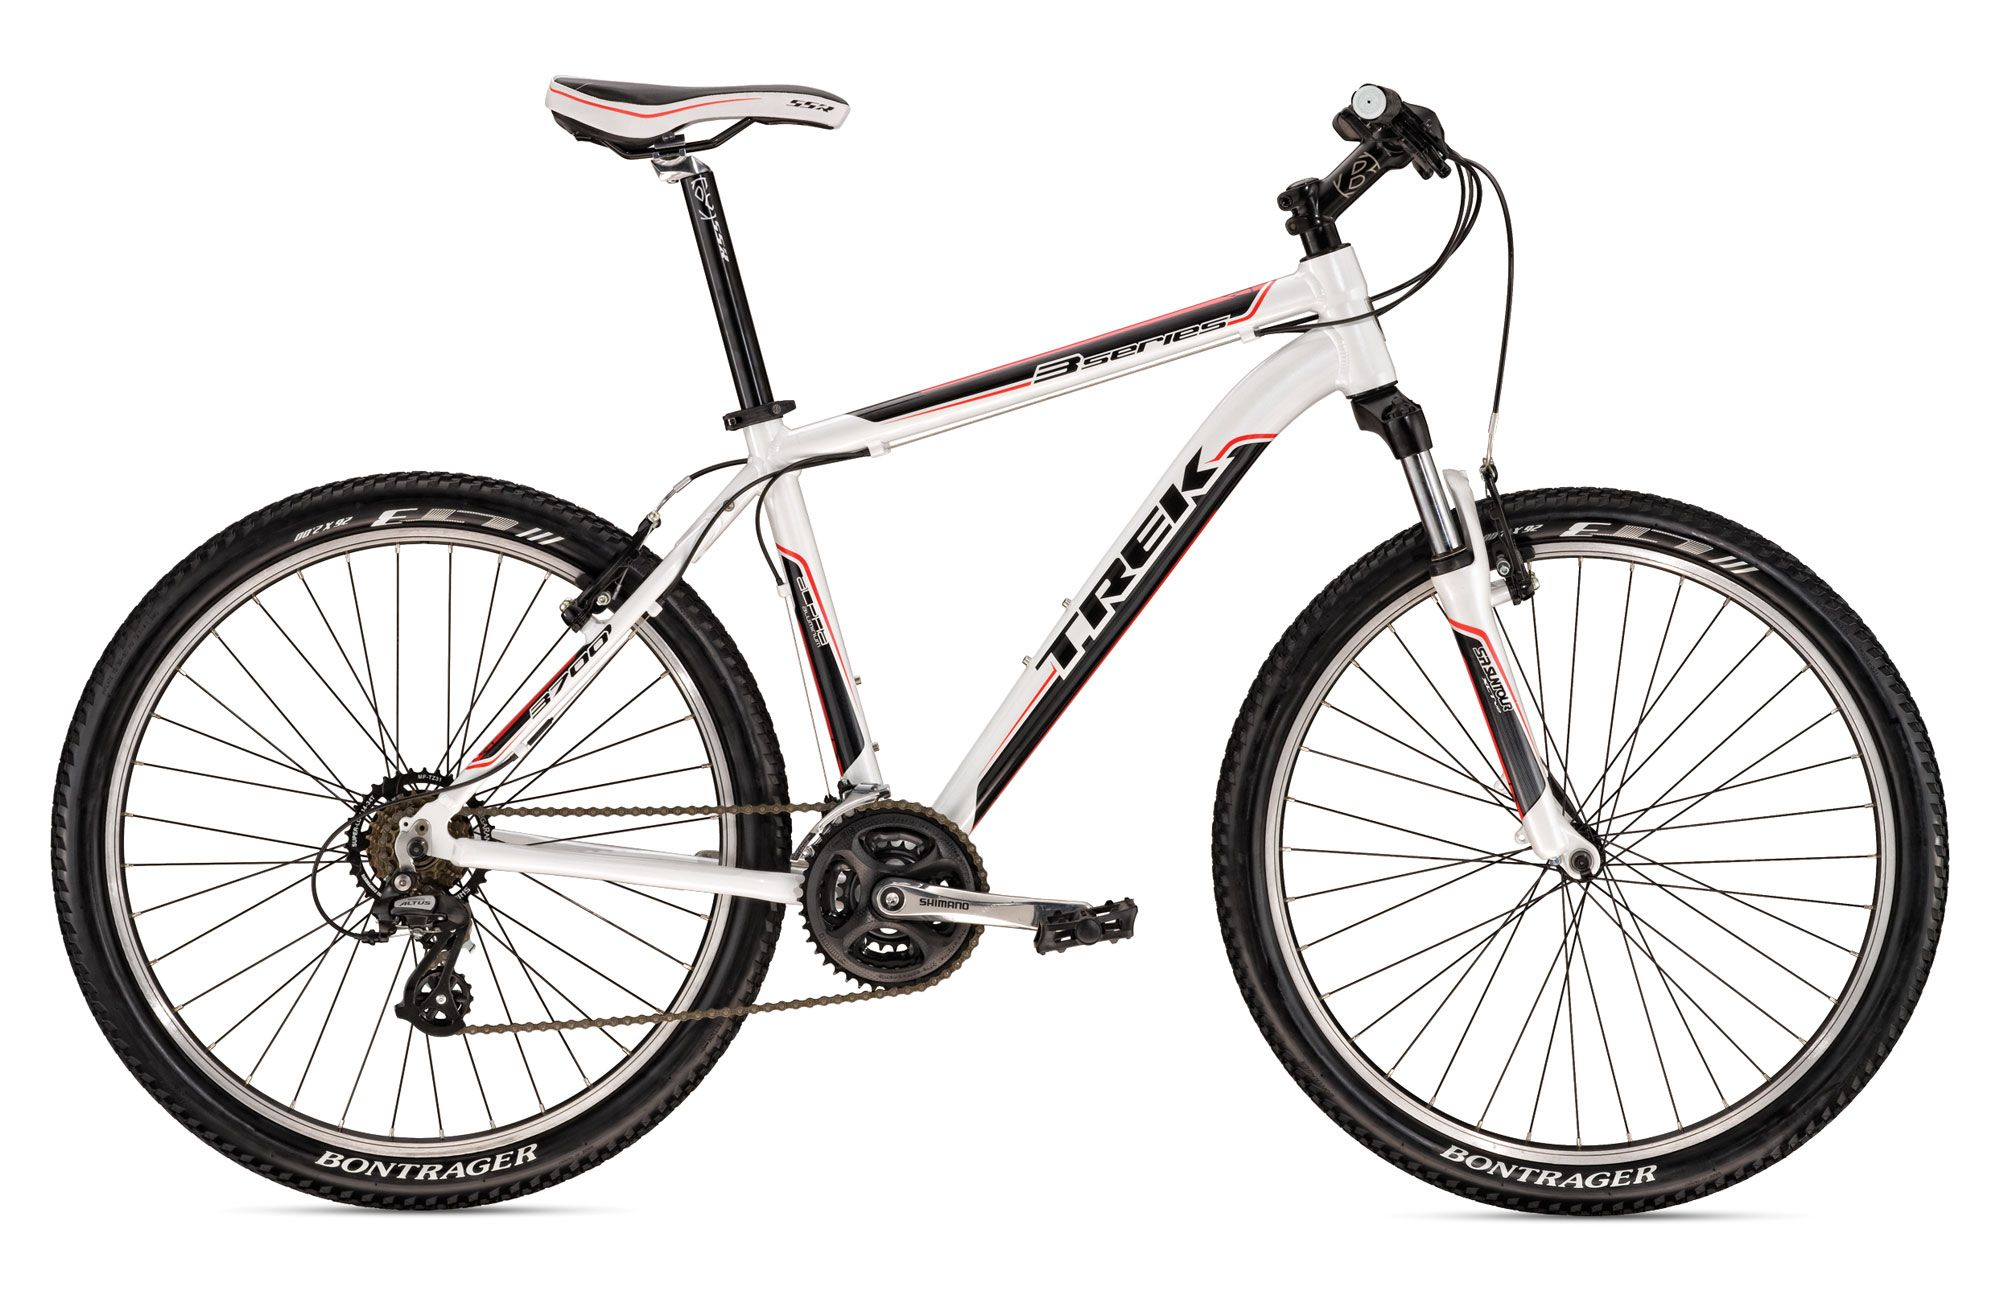 trek mountain bike hardtail 3700 | let it ride!! | pinterest | trek